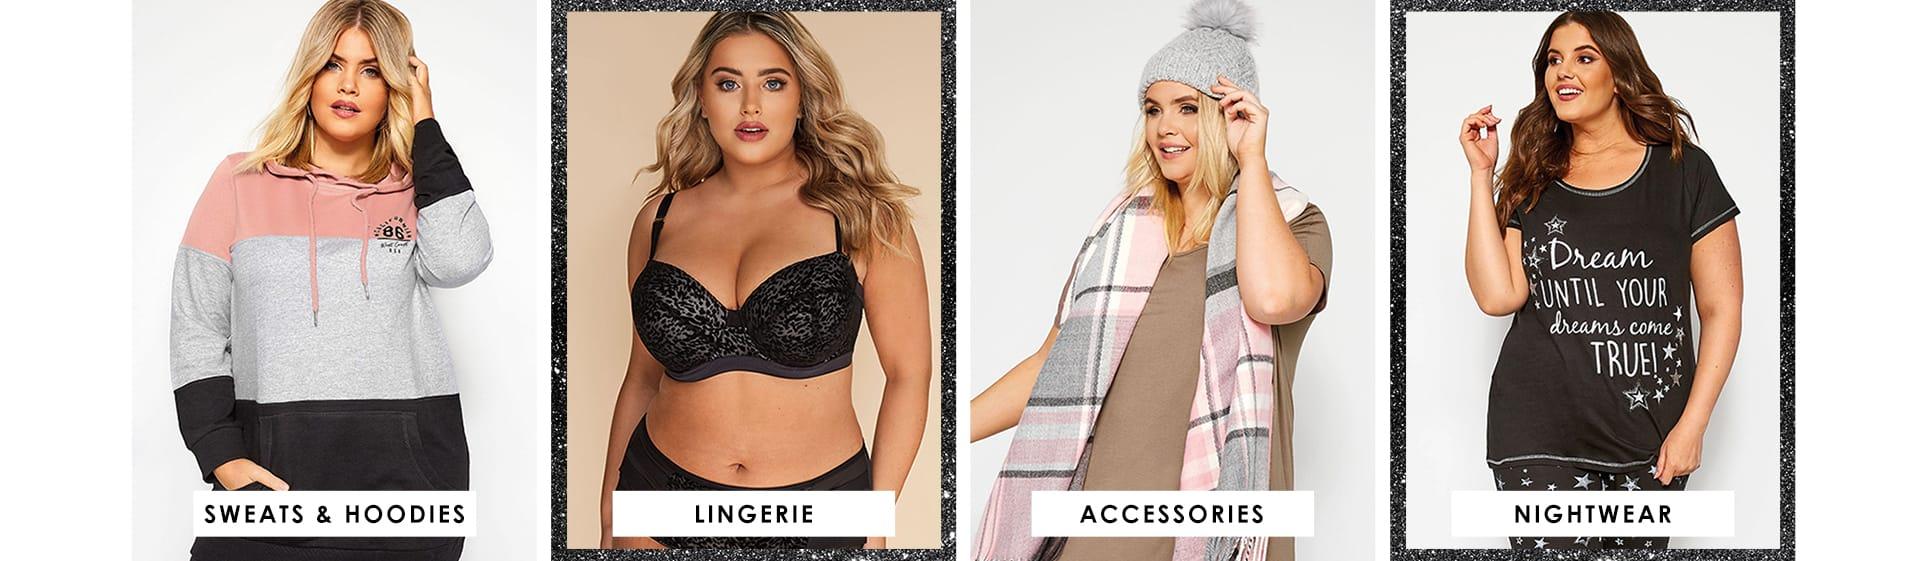 Sweats & hoodies - lingerie - accessories - nightwear